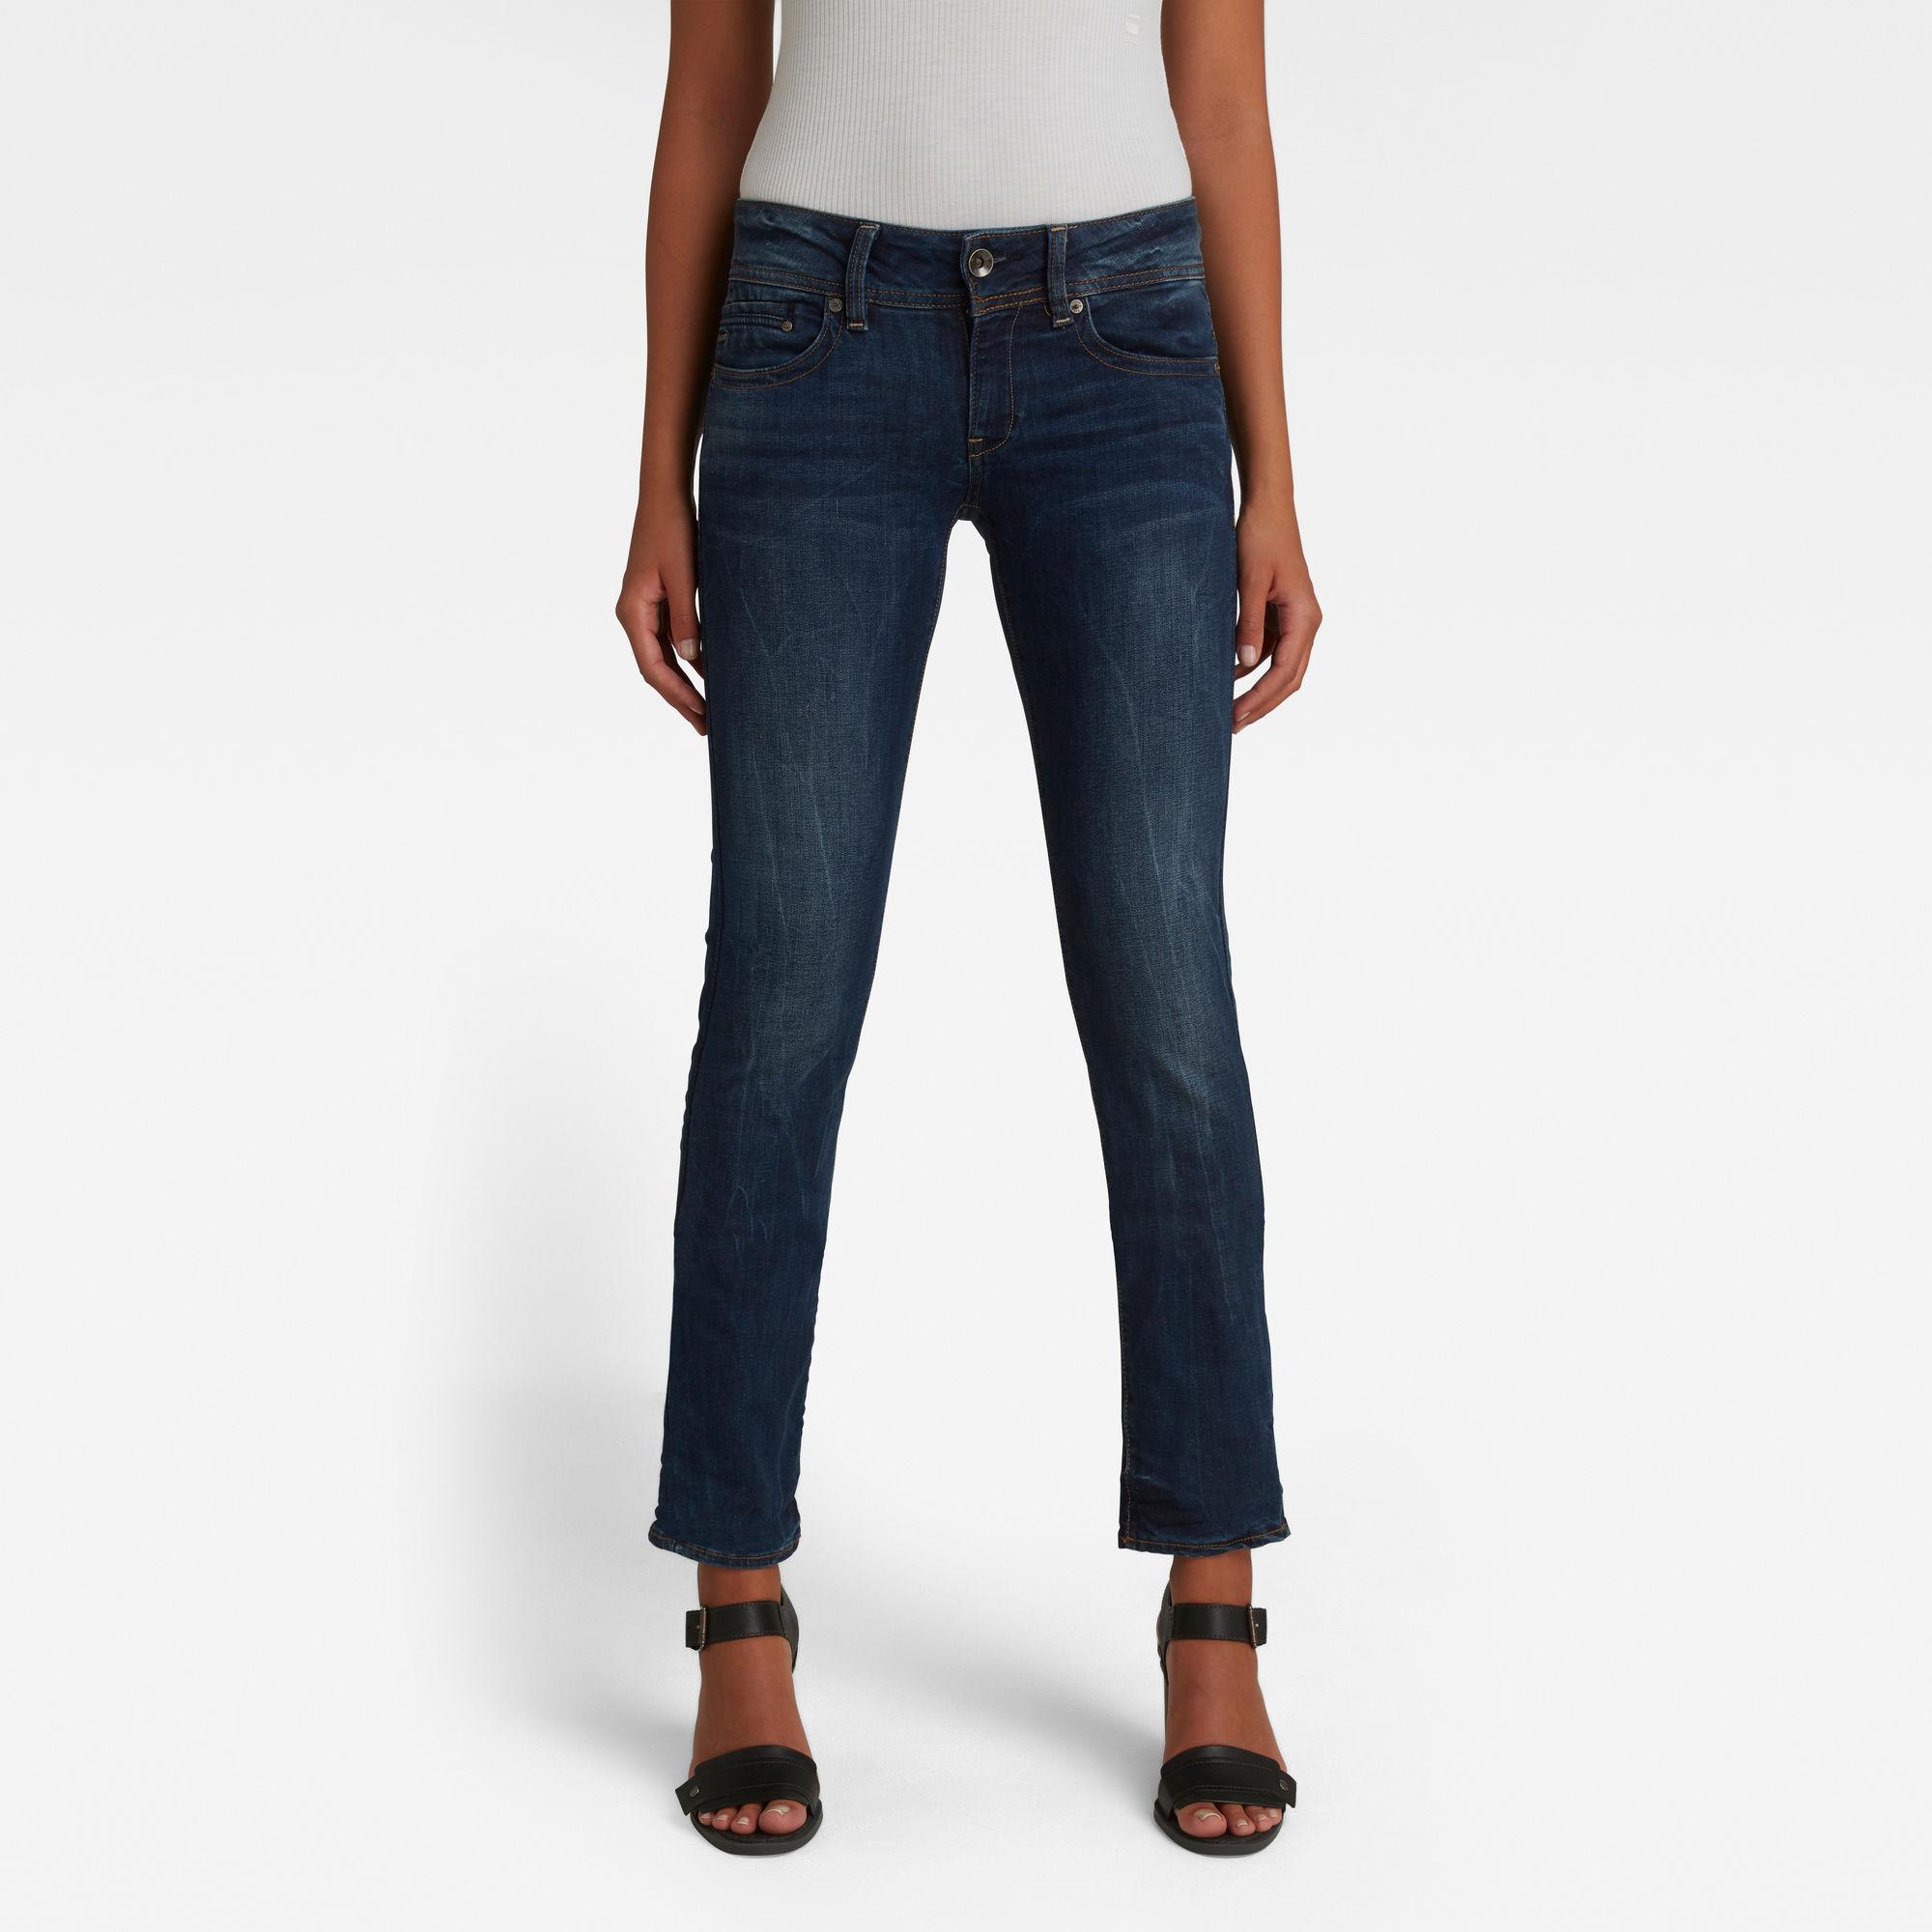 G-Star RAW Dames Midge Saddle Straight Jeans Donkerblauw